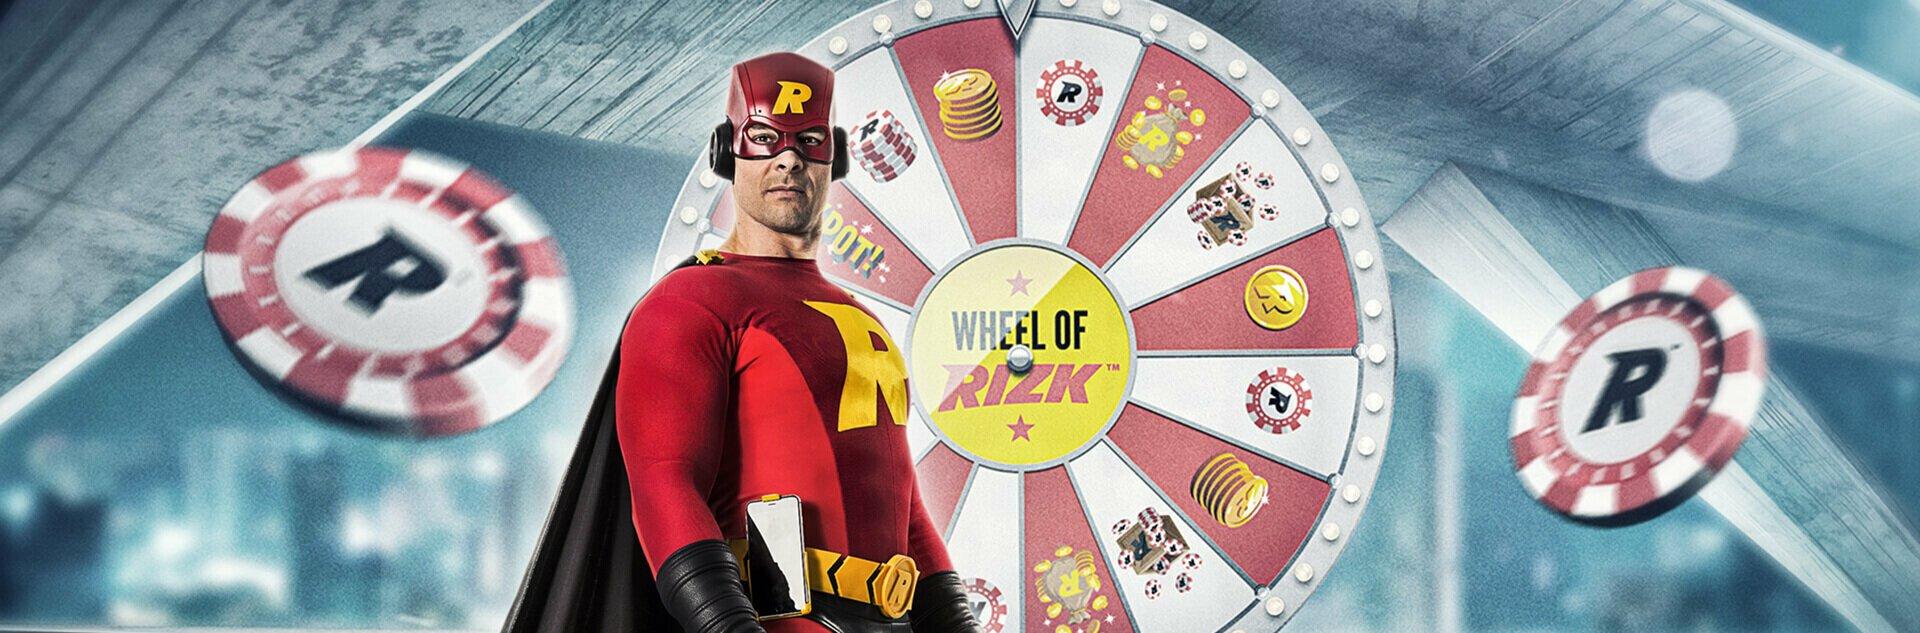 Rizk casino review UK